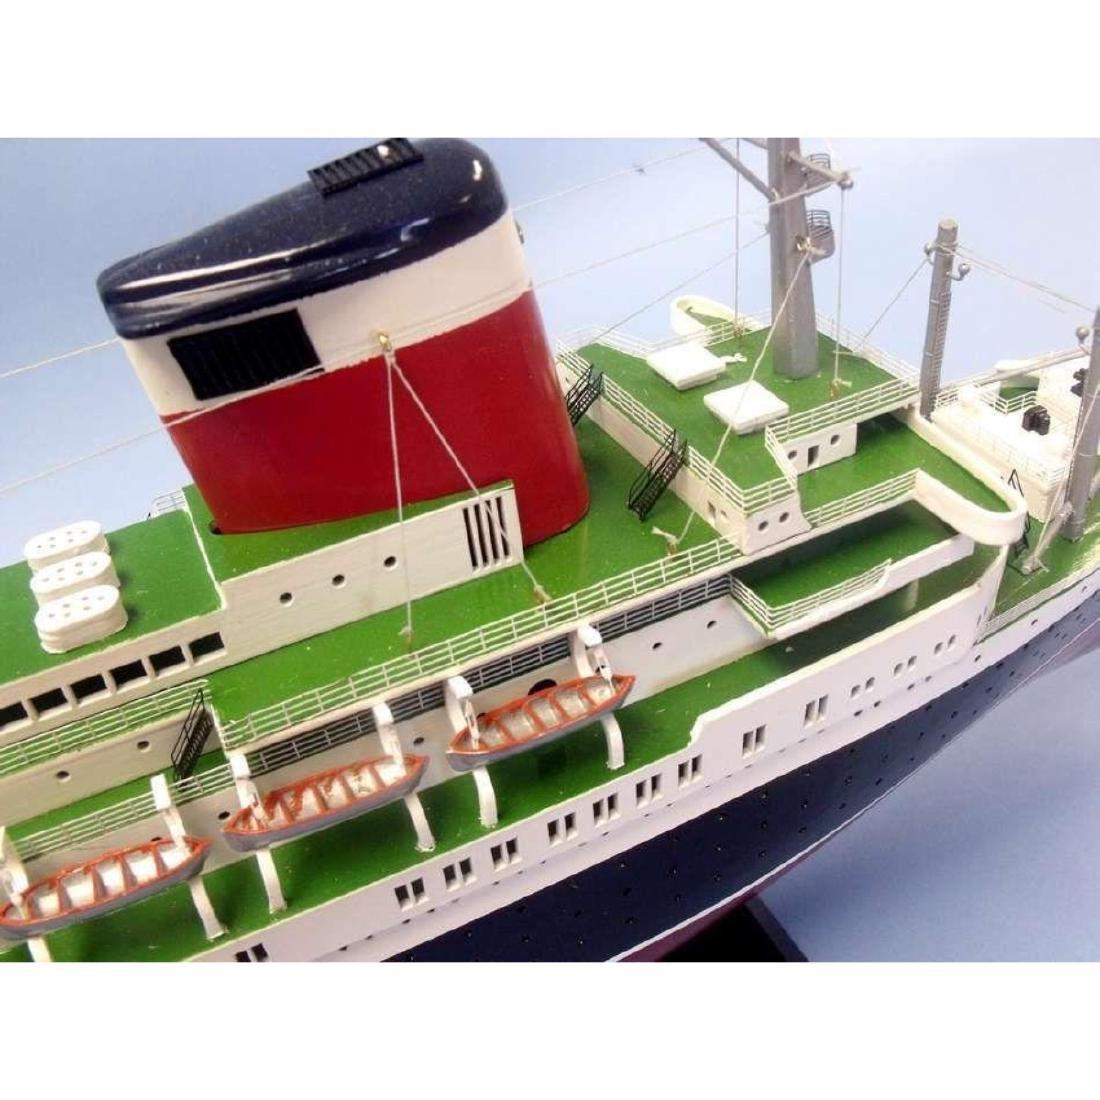 "SS United States Limited Model Cruise Ship 40"" w/ LED - 10"